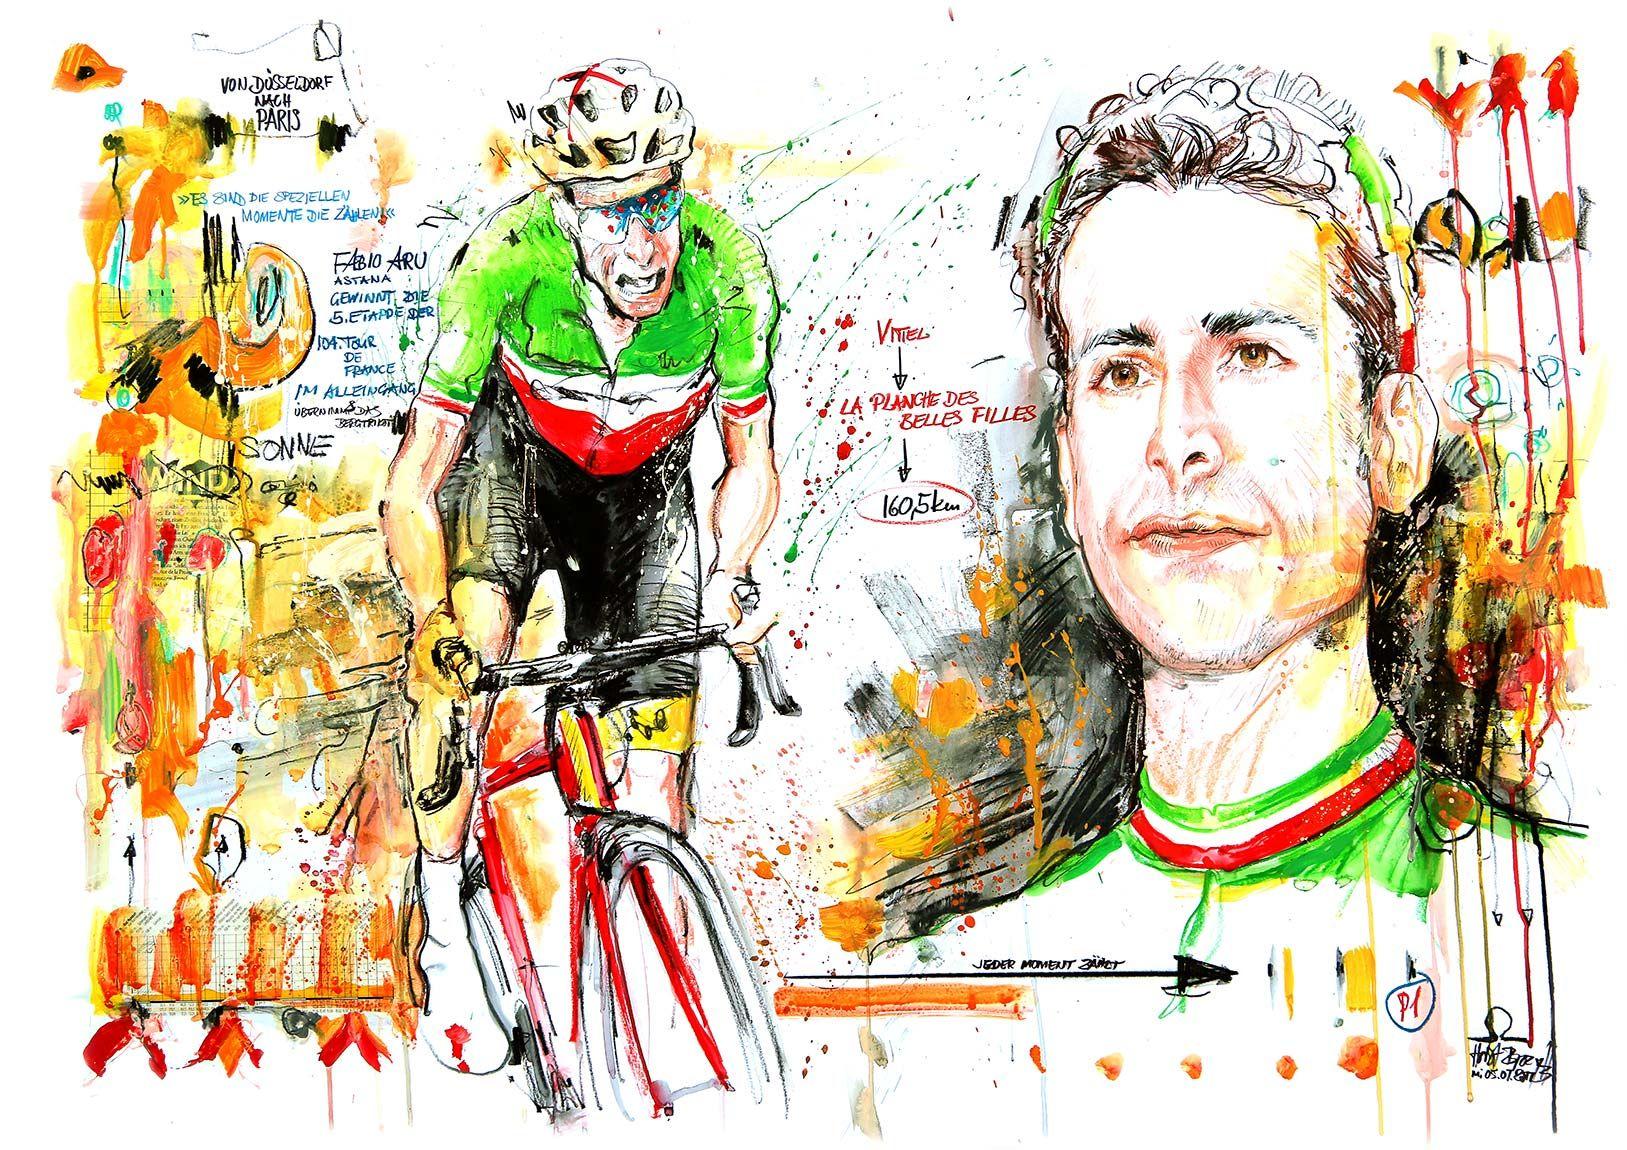 Fabio Aru Team Astana Bike Poster Bike Art Cycling Art